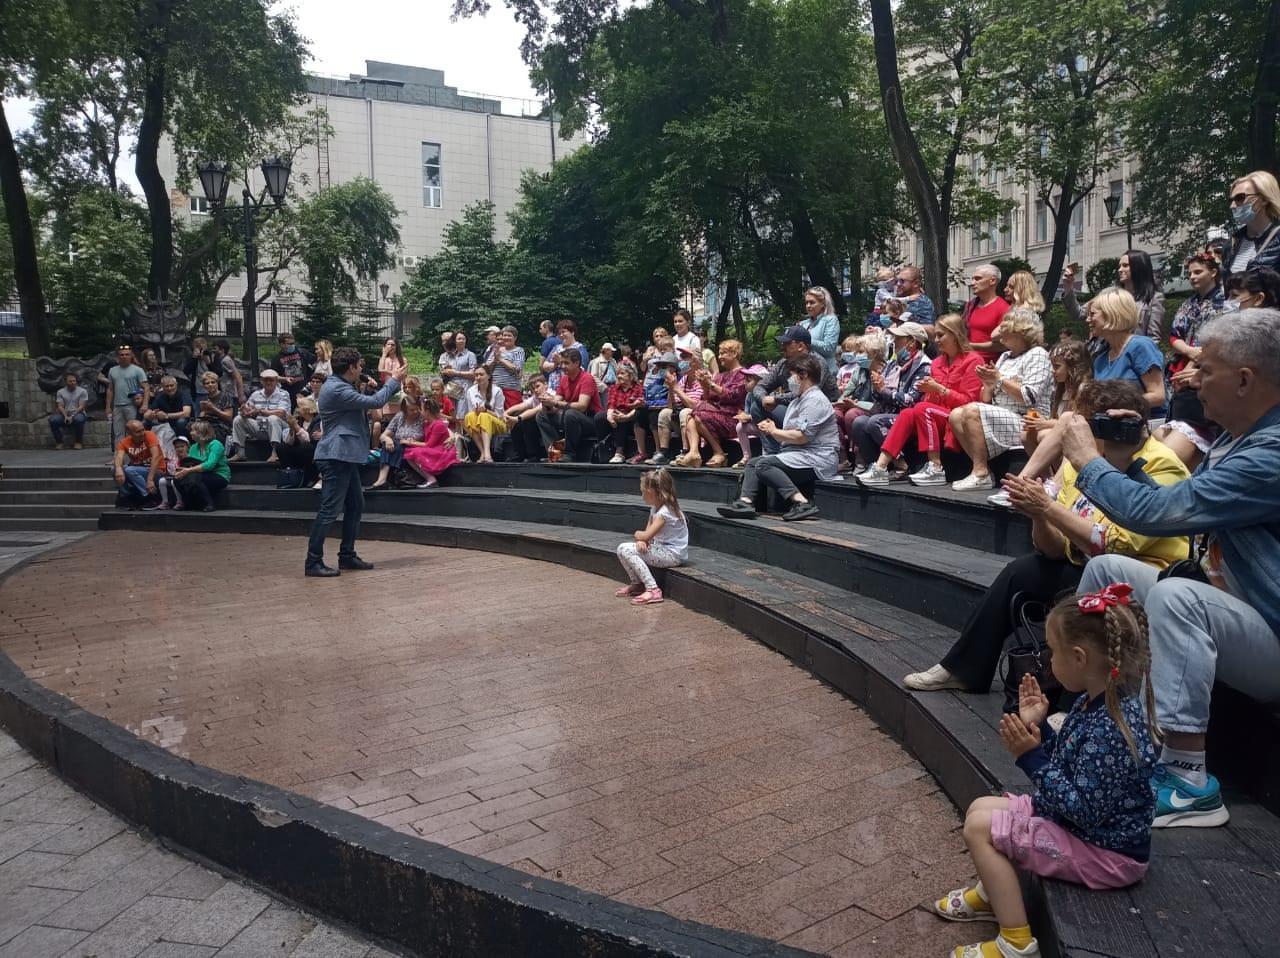 Юбилей Владивостока отпраздновали мини-концертом